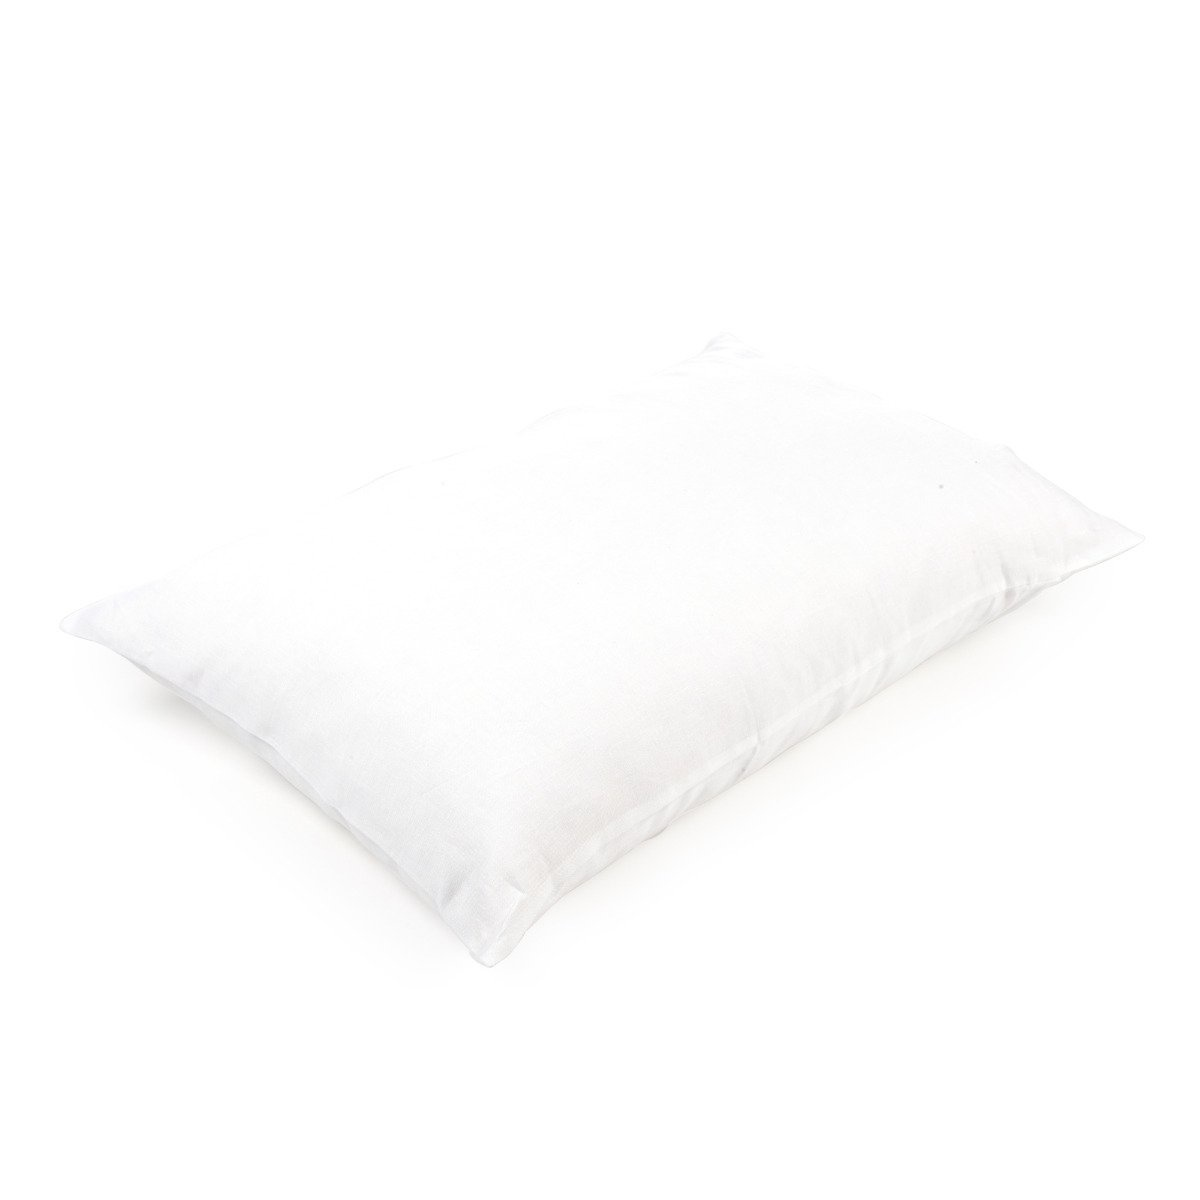 Pillowcase - Santiago - Asst Colours-1